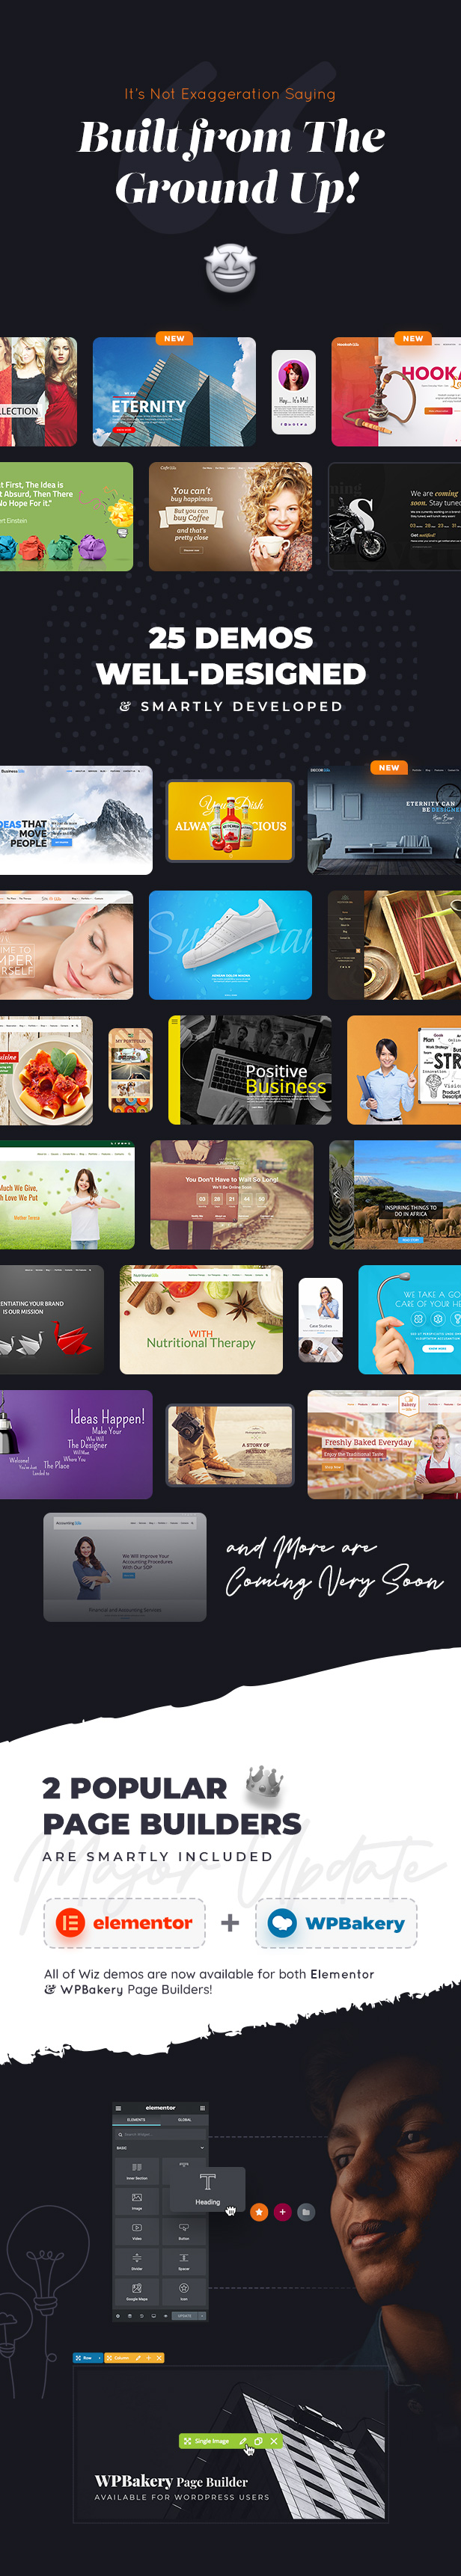 Wiz - Elementor MultiPurpose WordPress Theme - 2